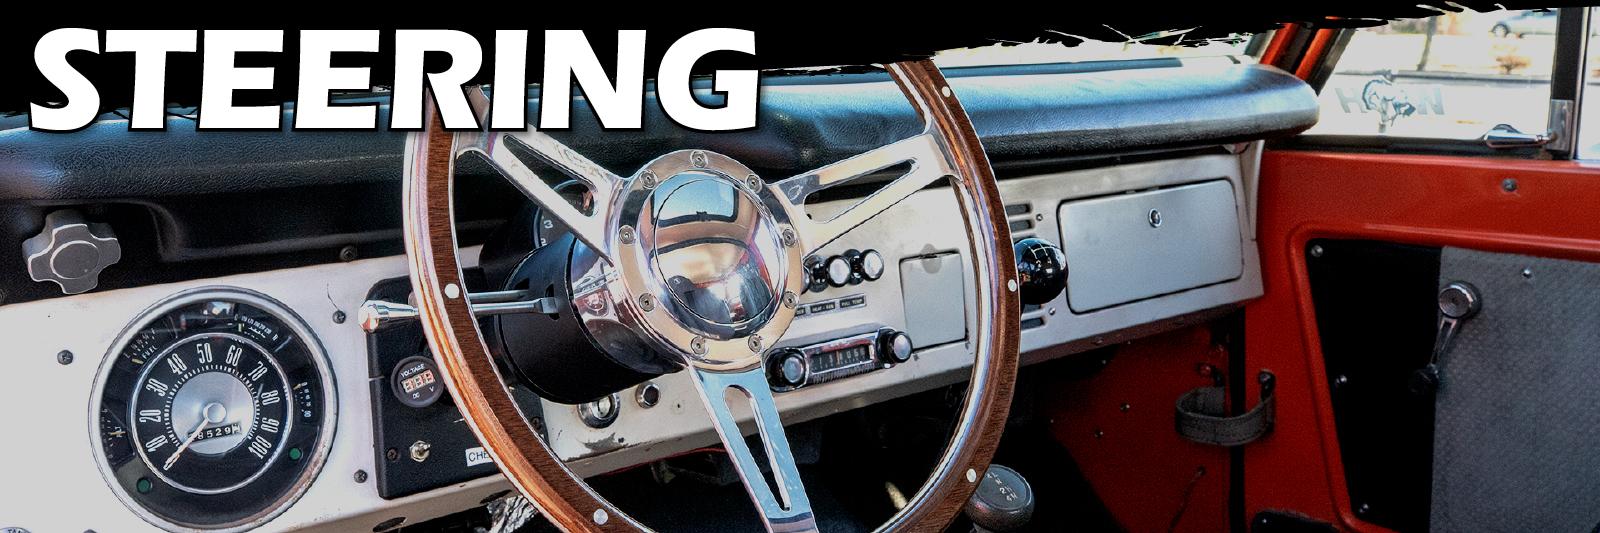 hight resolution of steering wheels stock